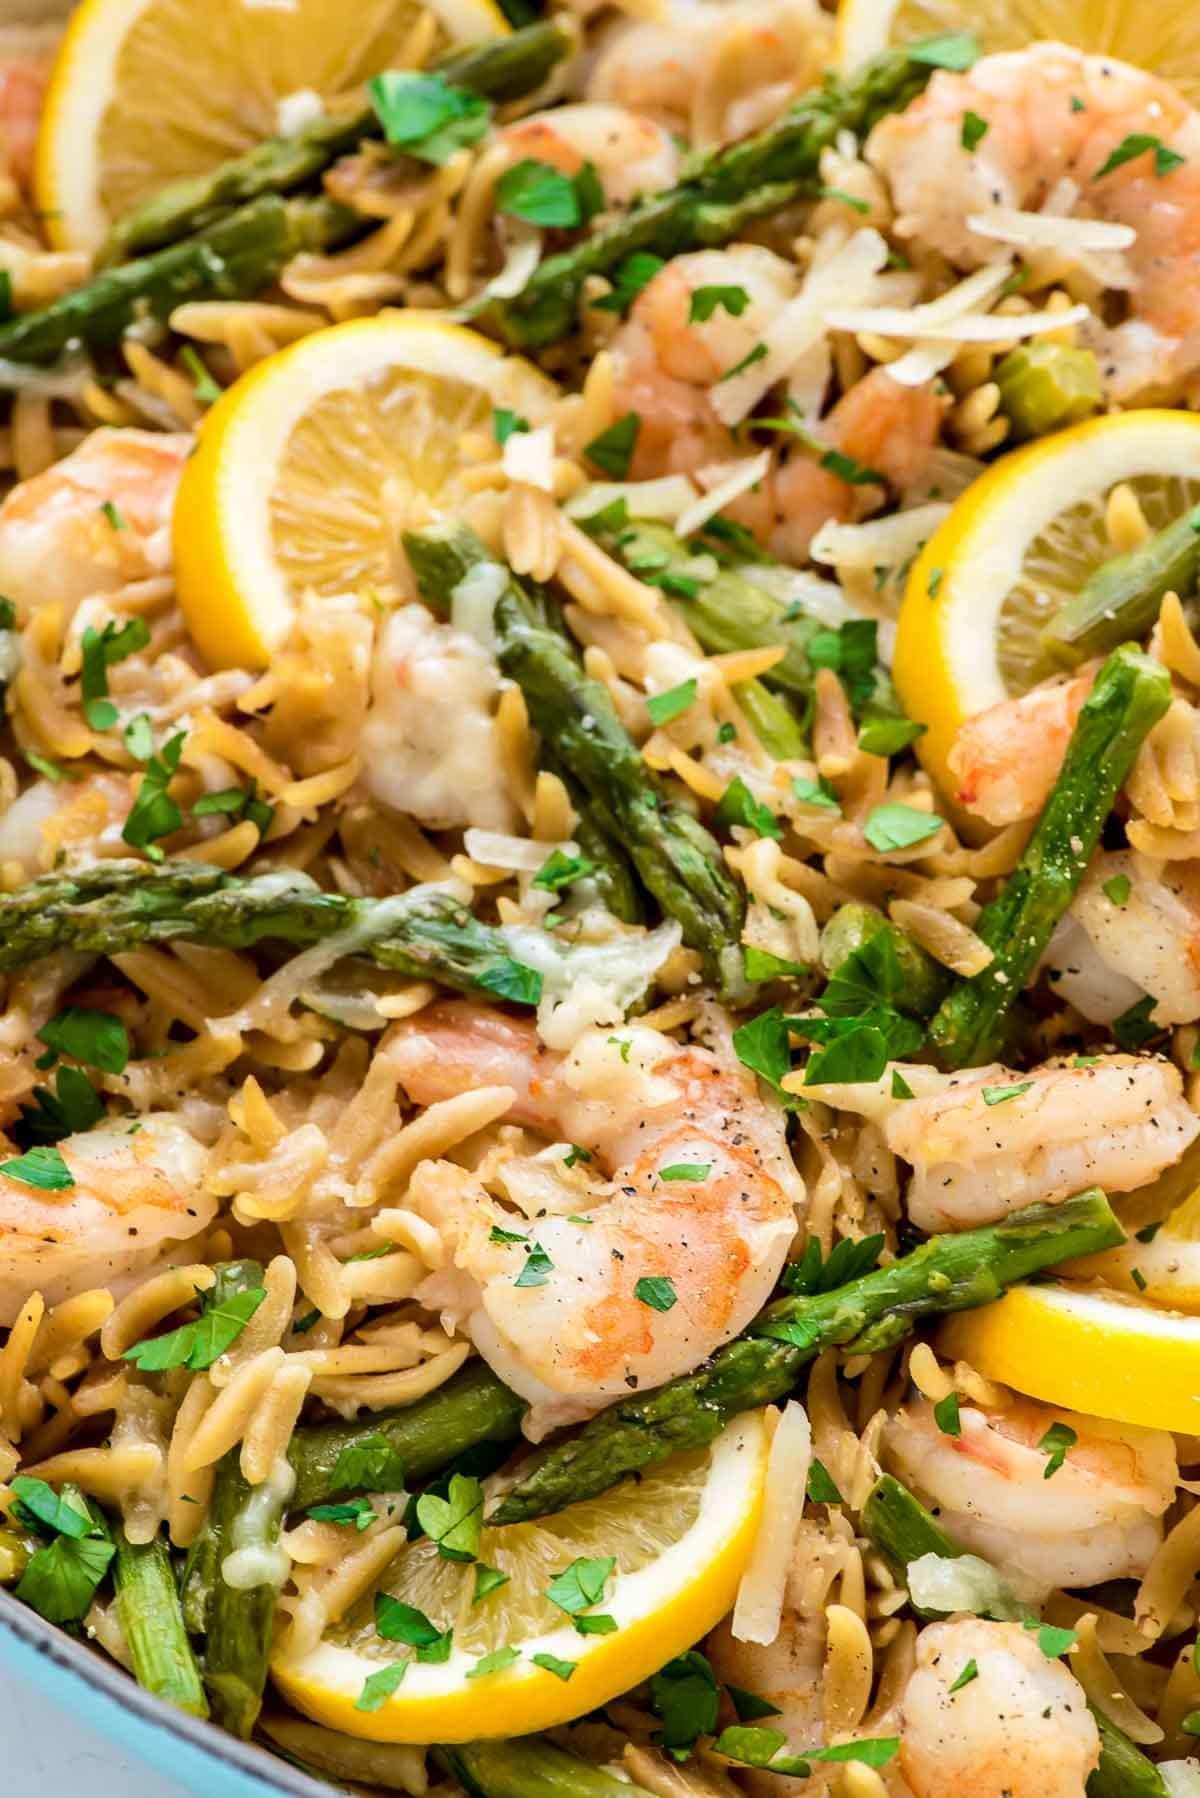 Lemon Shrimp Pasta with Orzo and Asparagus